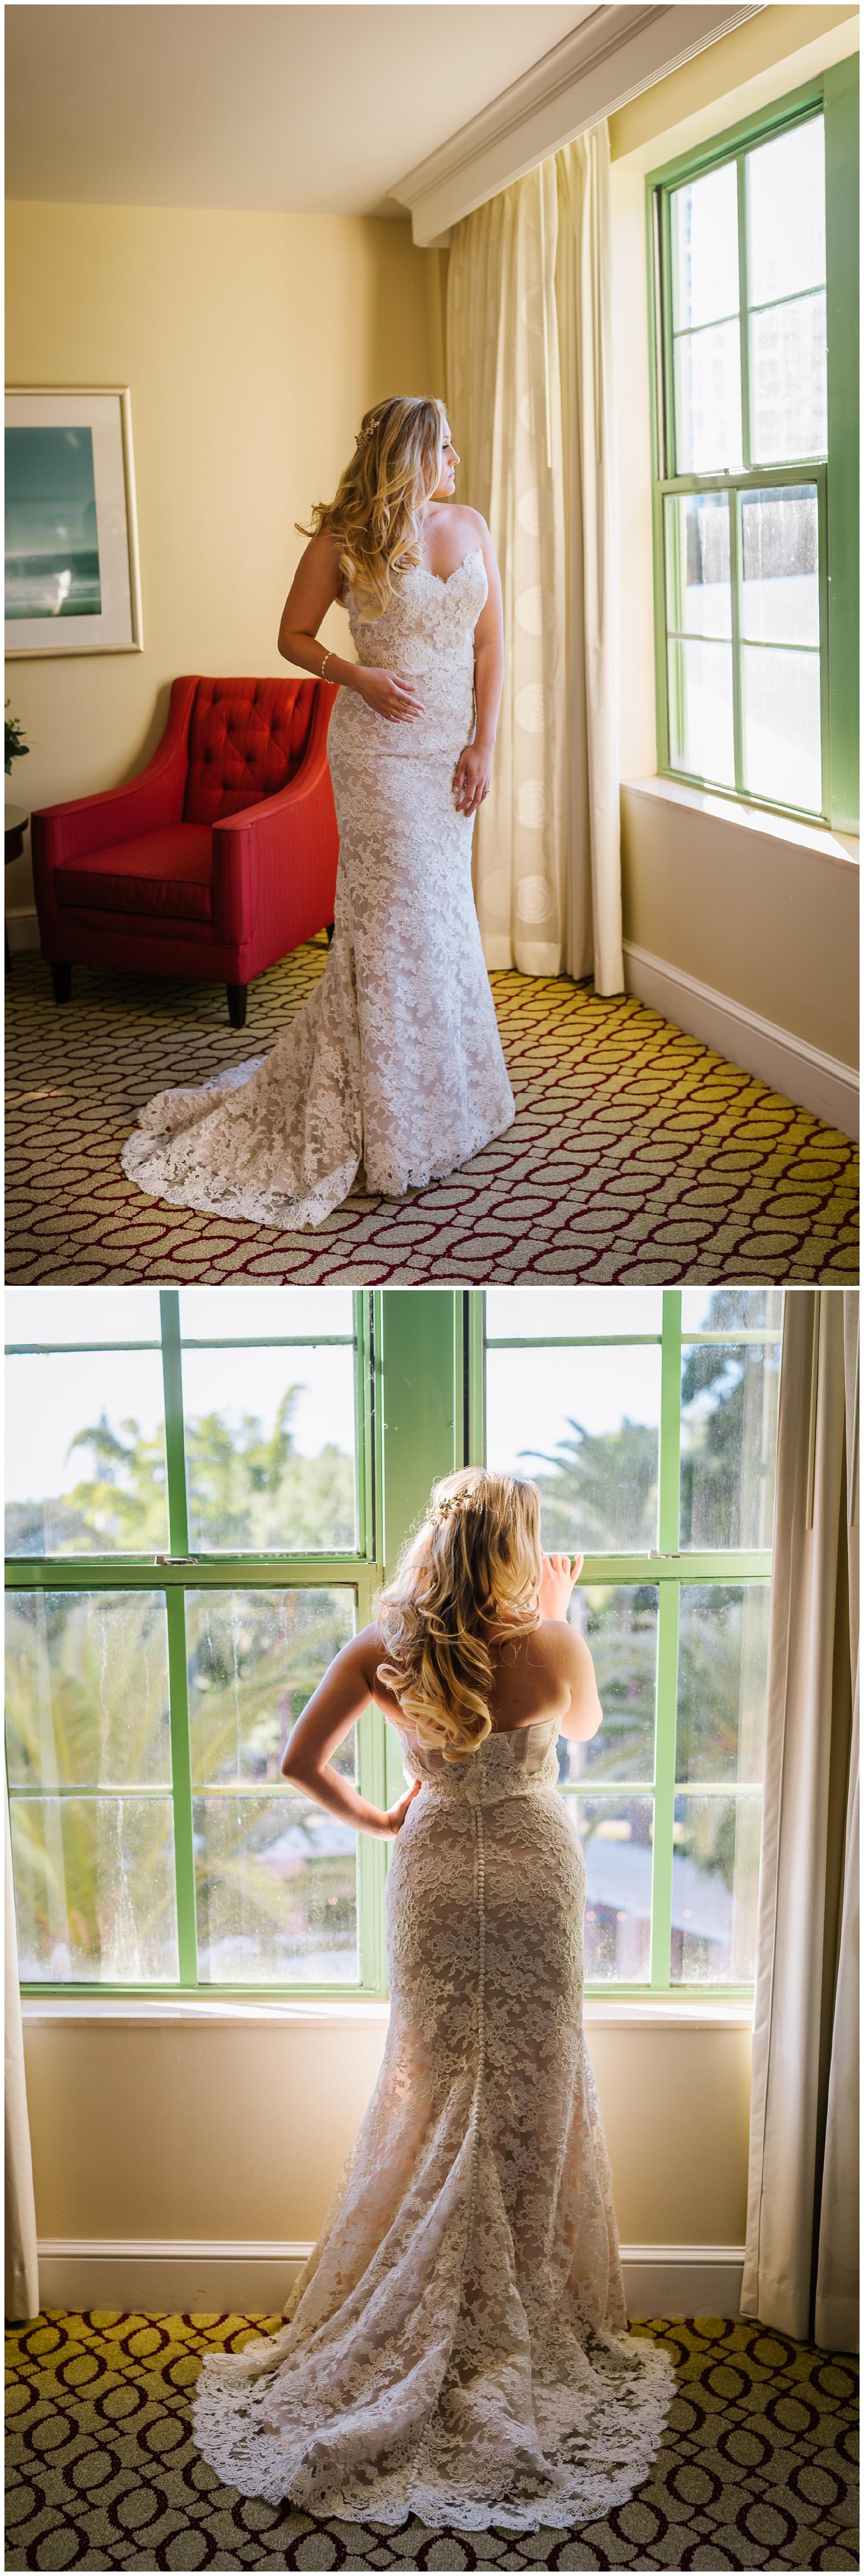 St-pete-wedding-photographer-grand-ballroom-vinoy-tea-garden-greek-luxury_0119.jpg